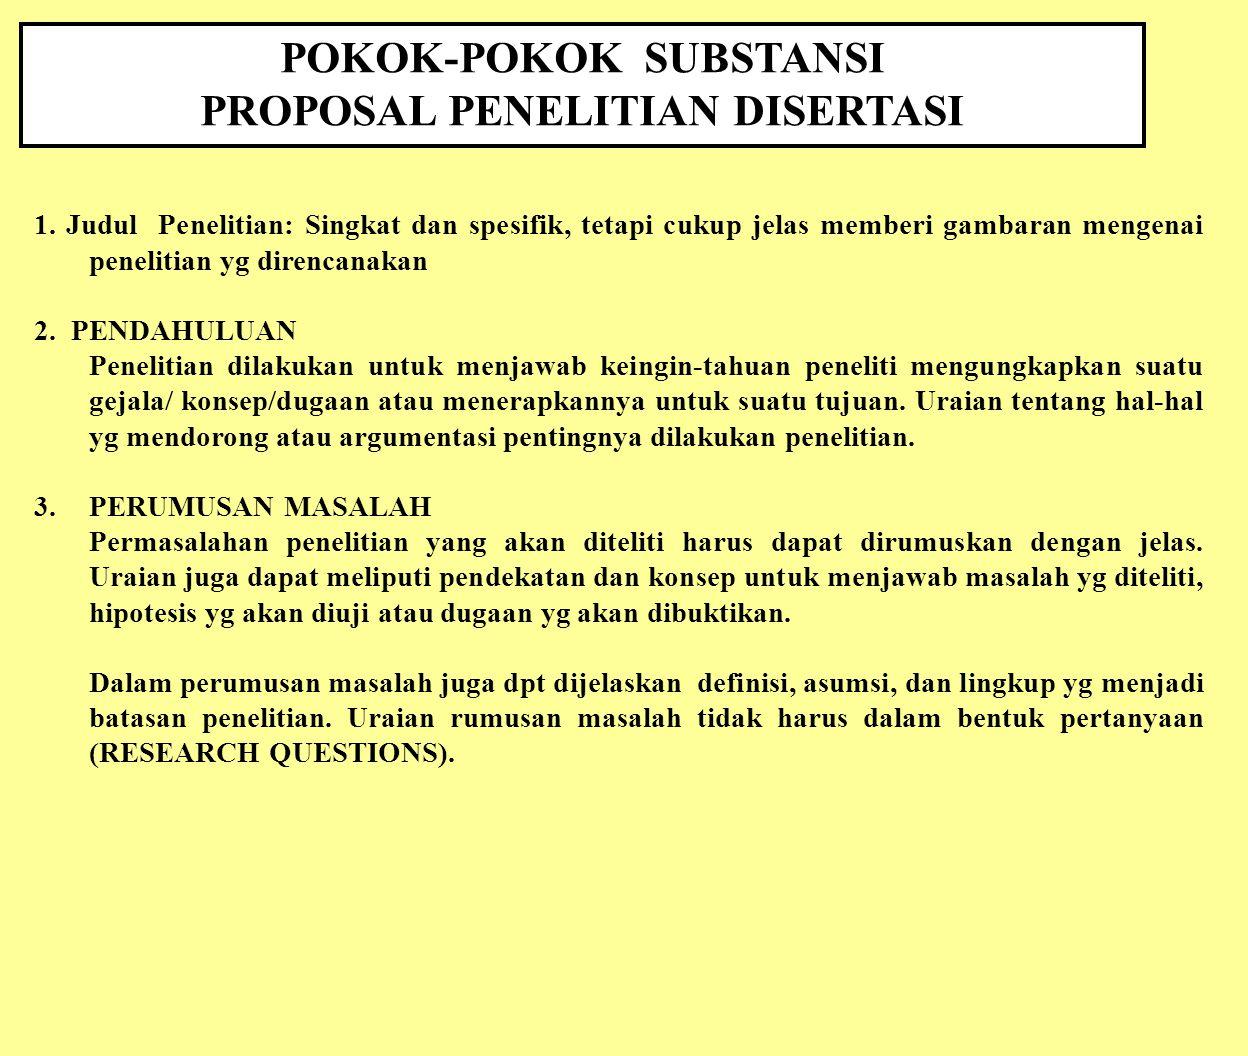 POKOK-POKOK SUBSTANSI PROPOSAL PENELITIAN DISERTASI